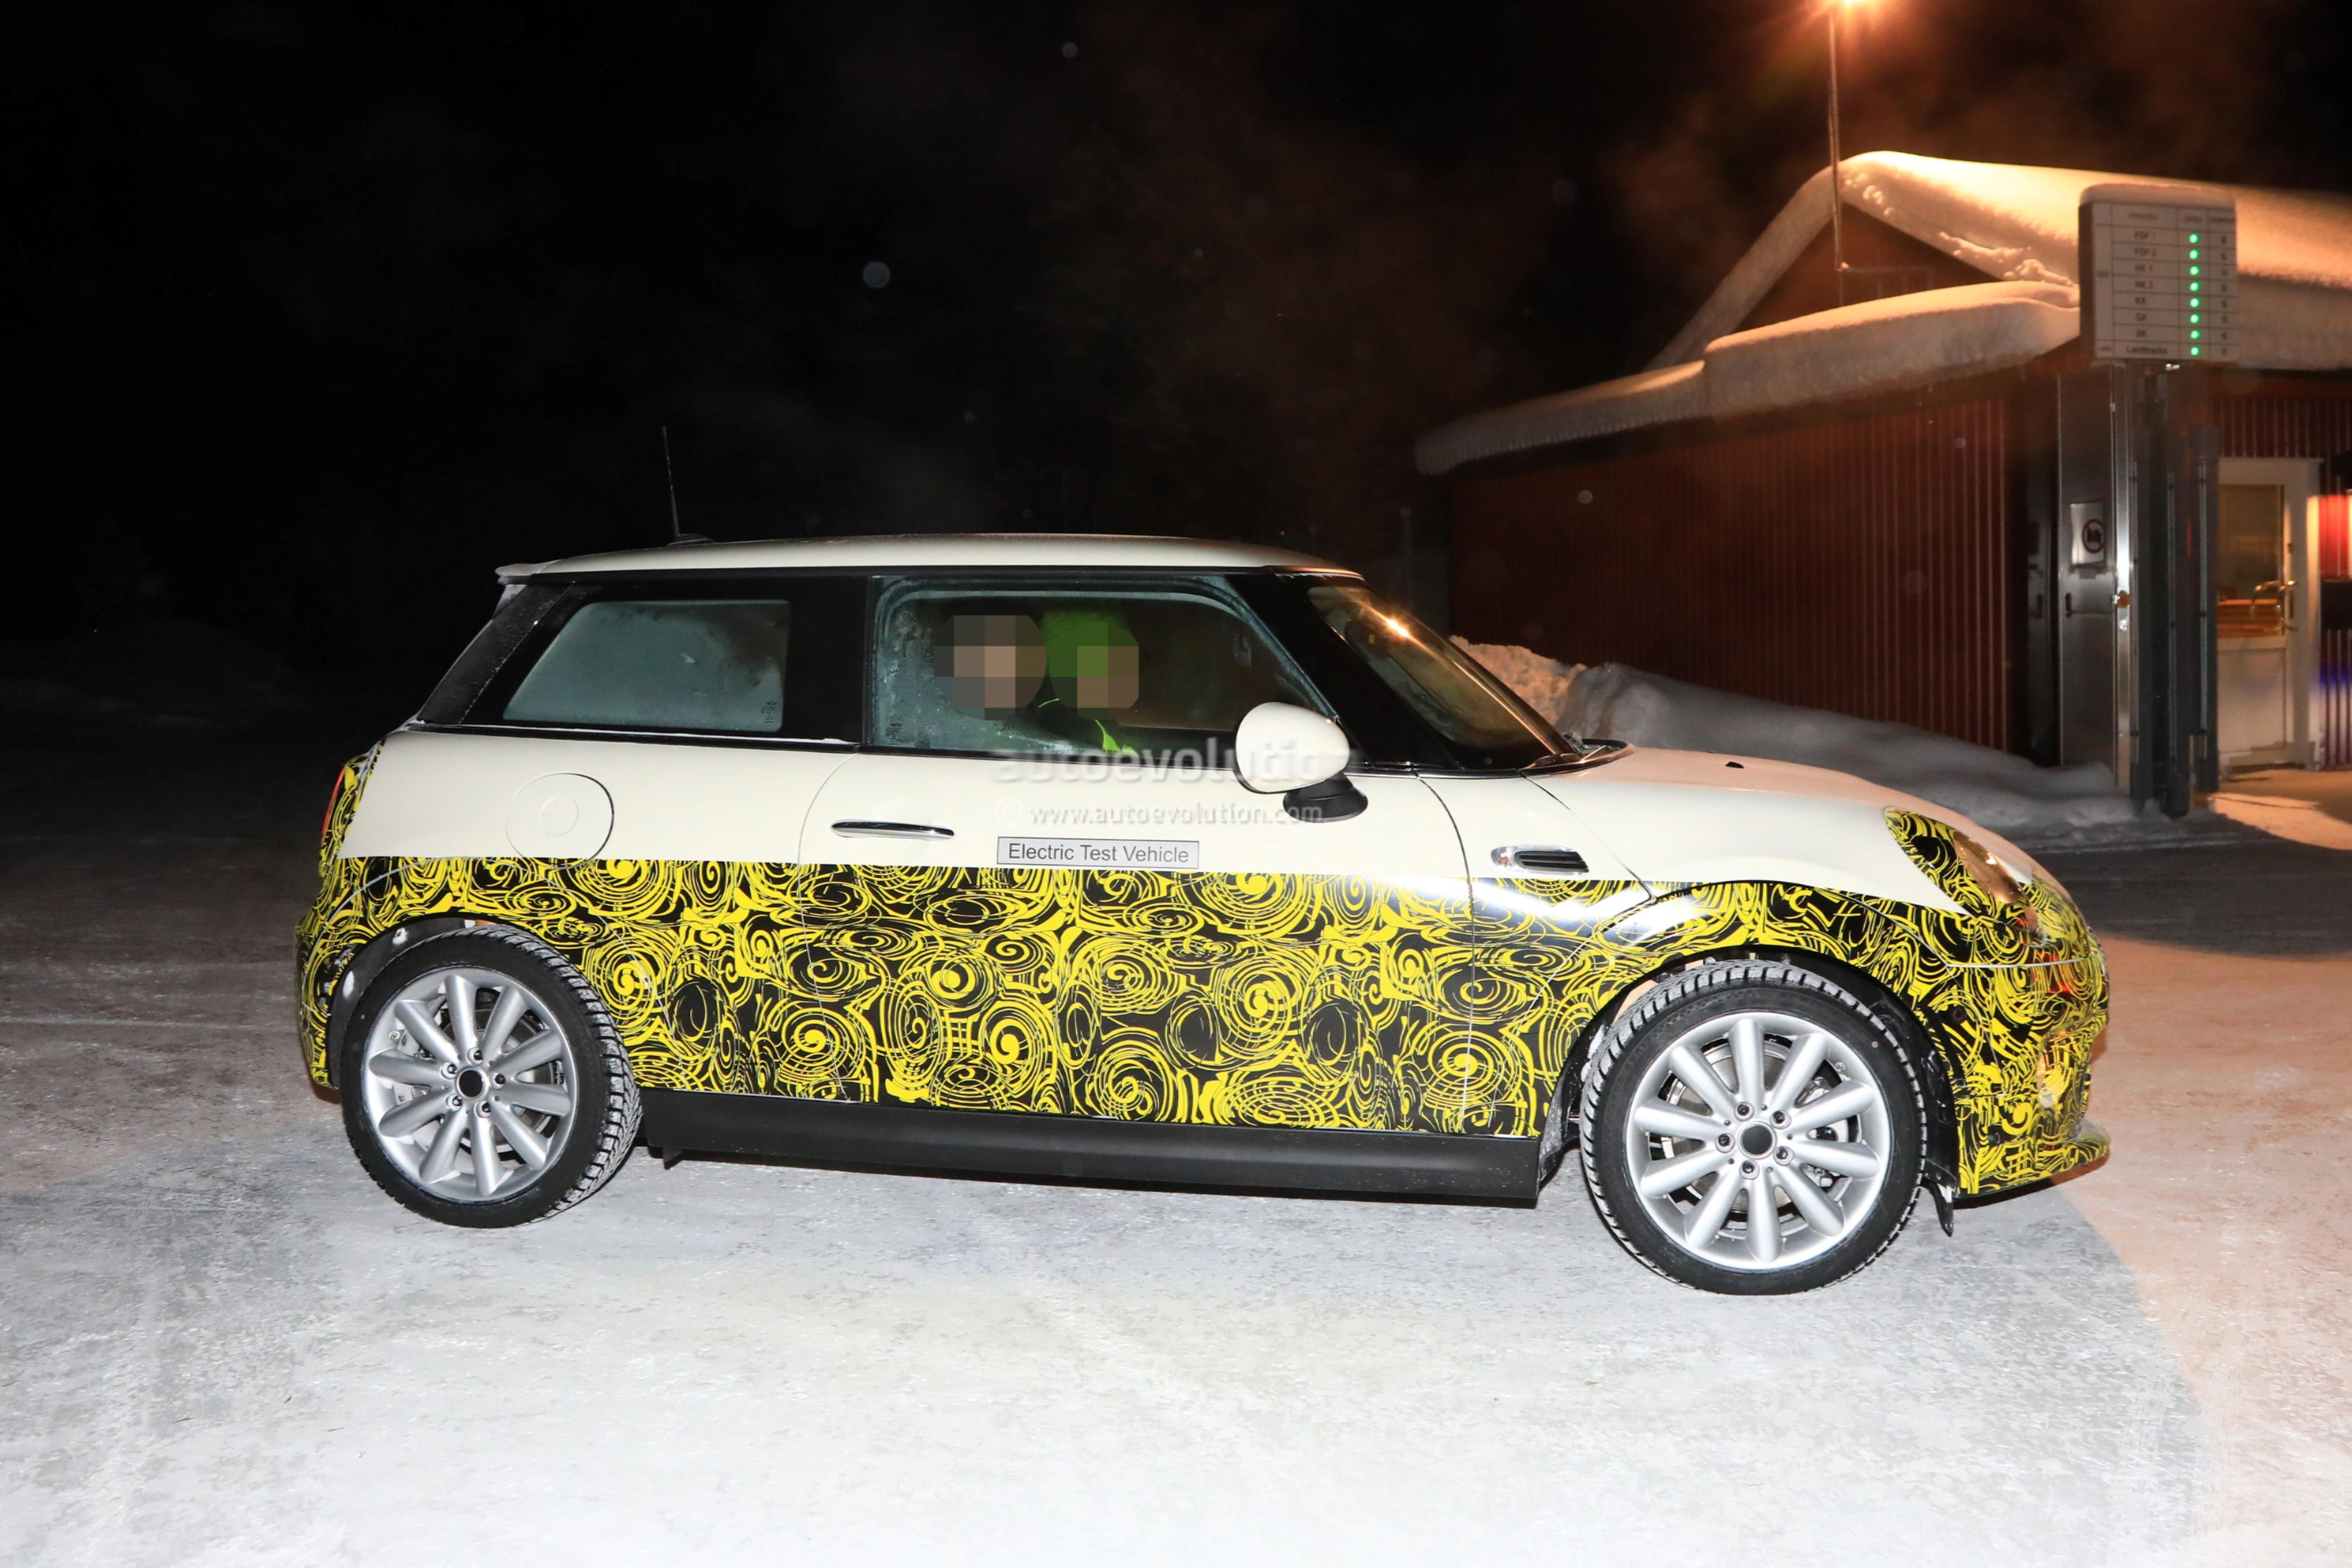 2019 mini cooper e electric vehicle spied testing at 30. Black Bedroom Furniture Sets. Home Design Ideas